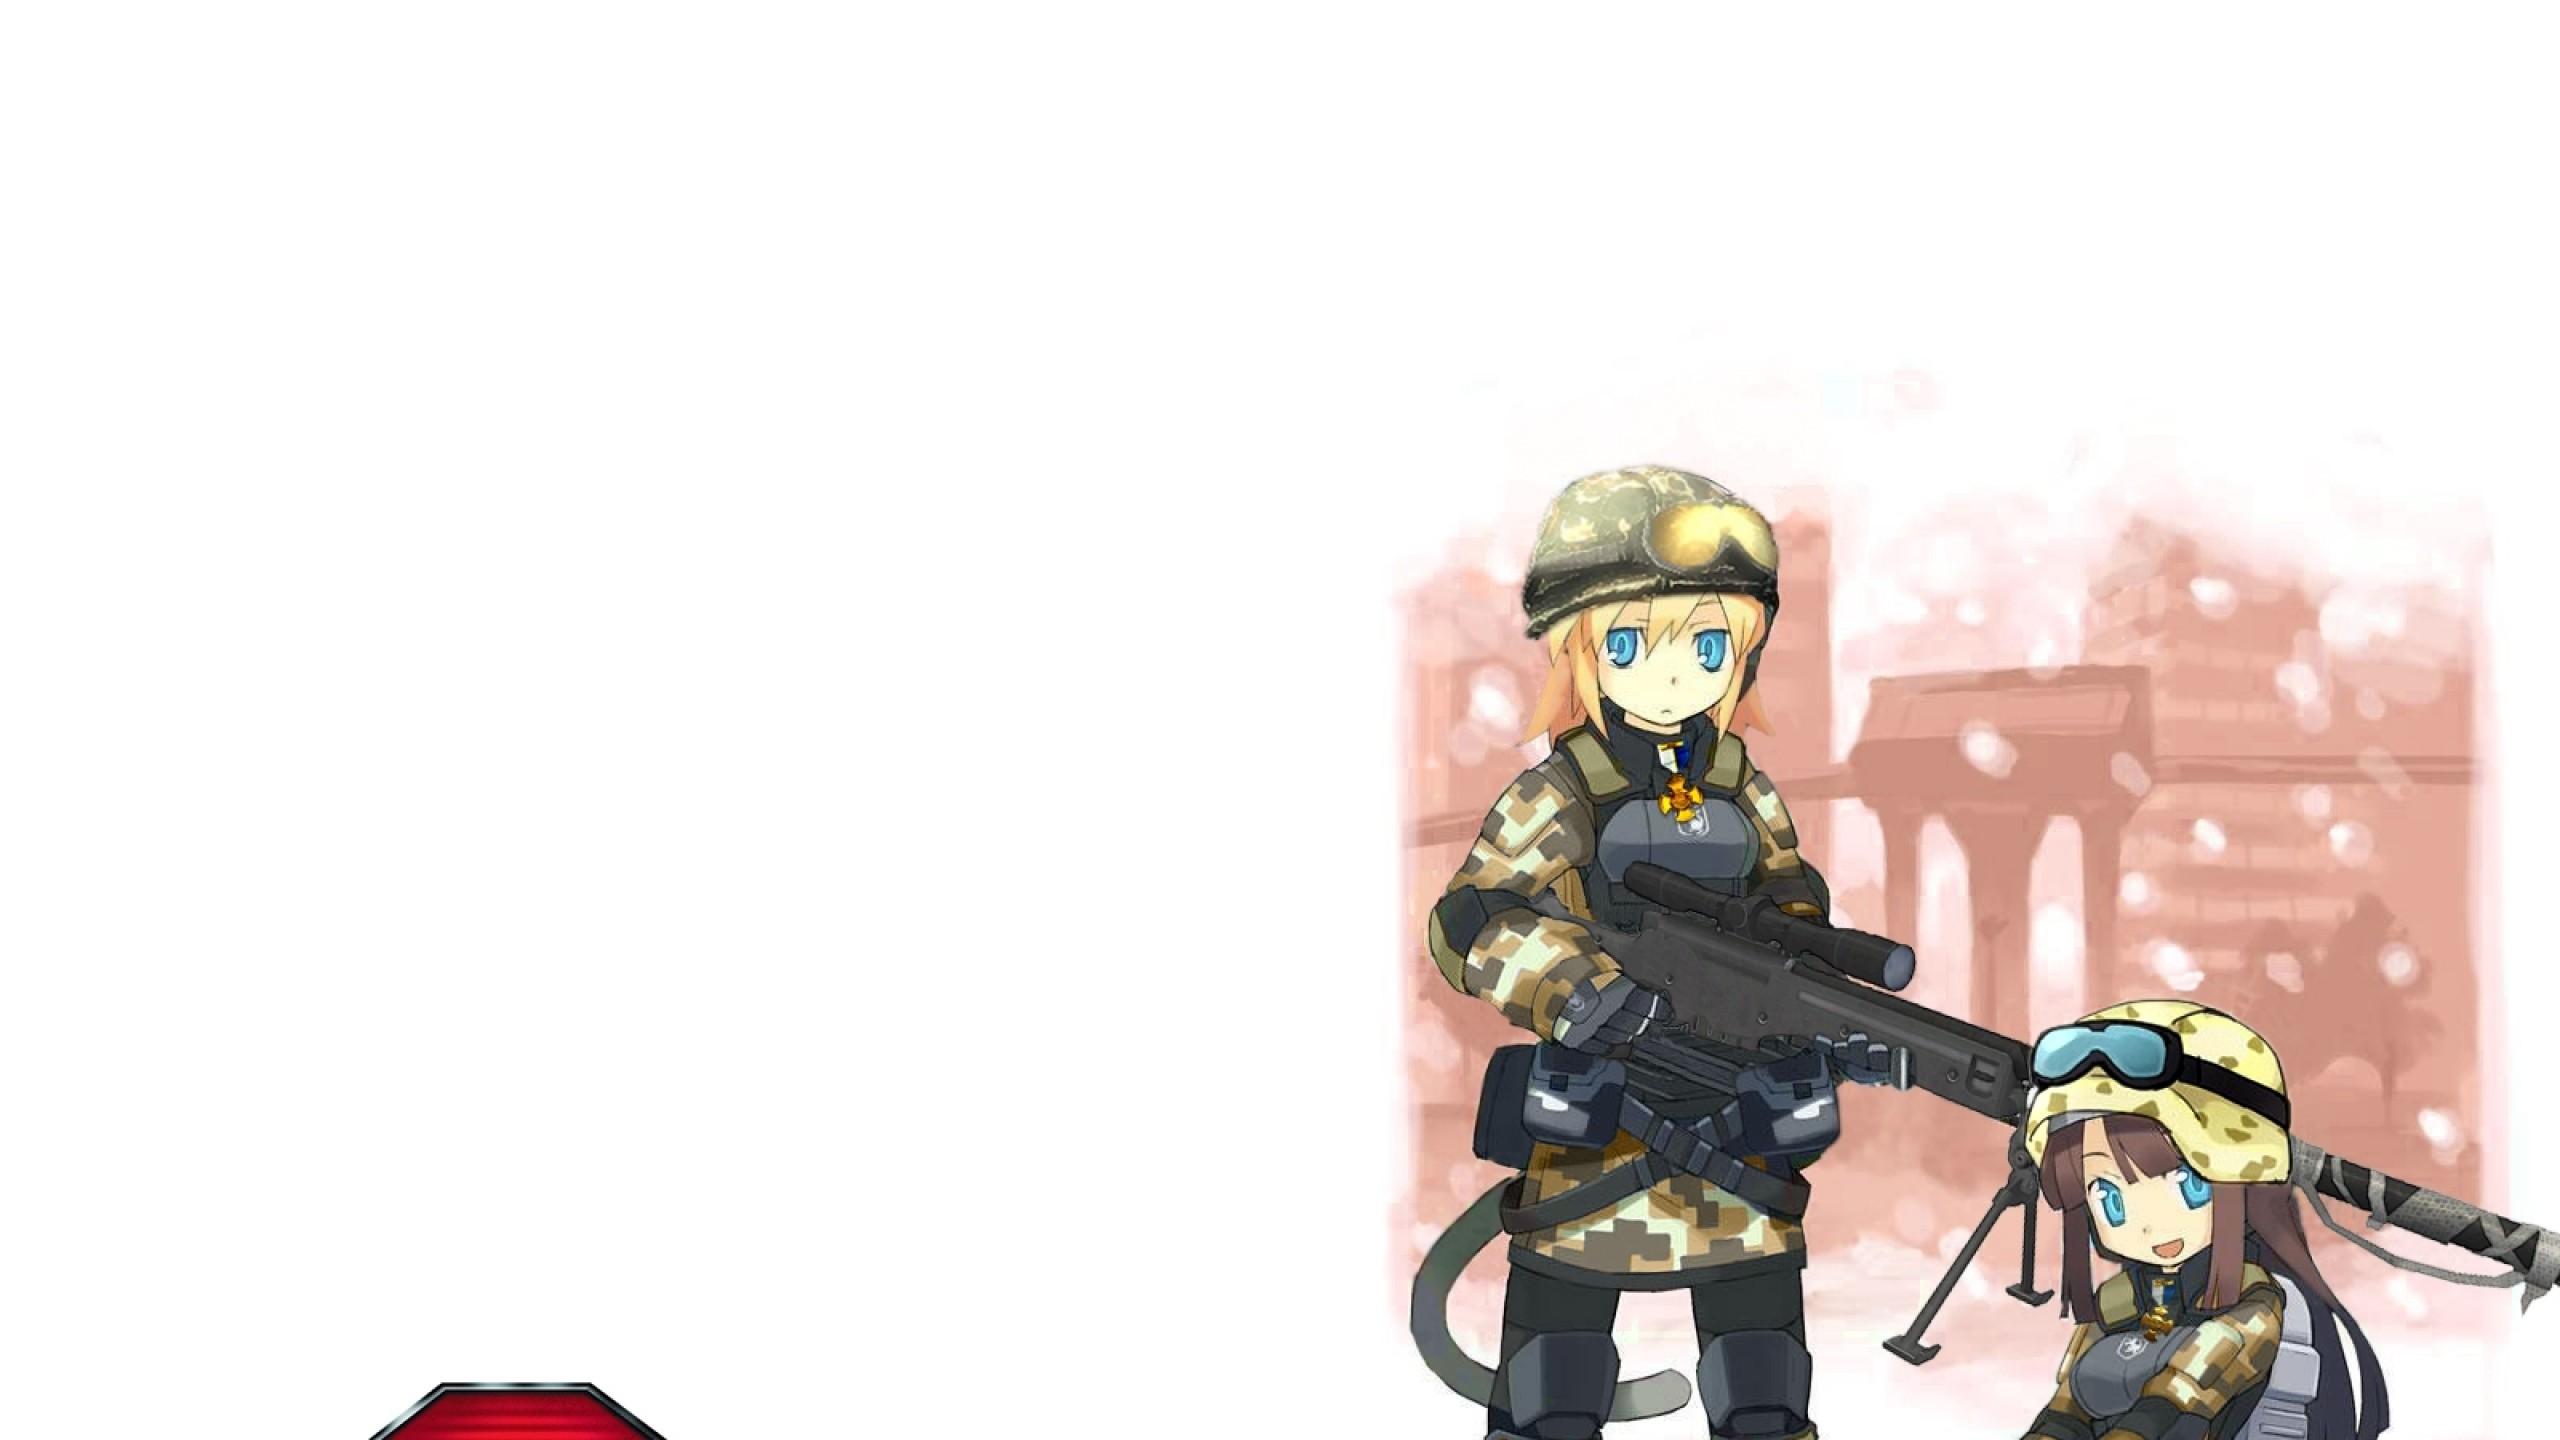 Anime Gun Wallpaper (61+ images)